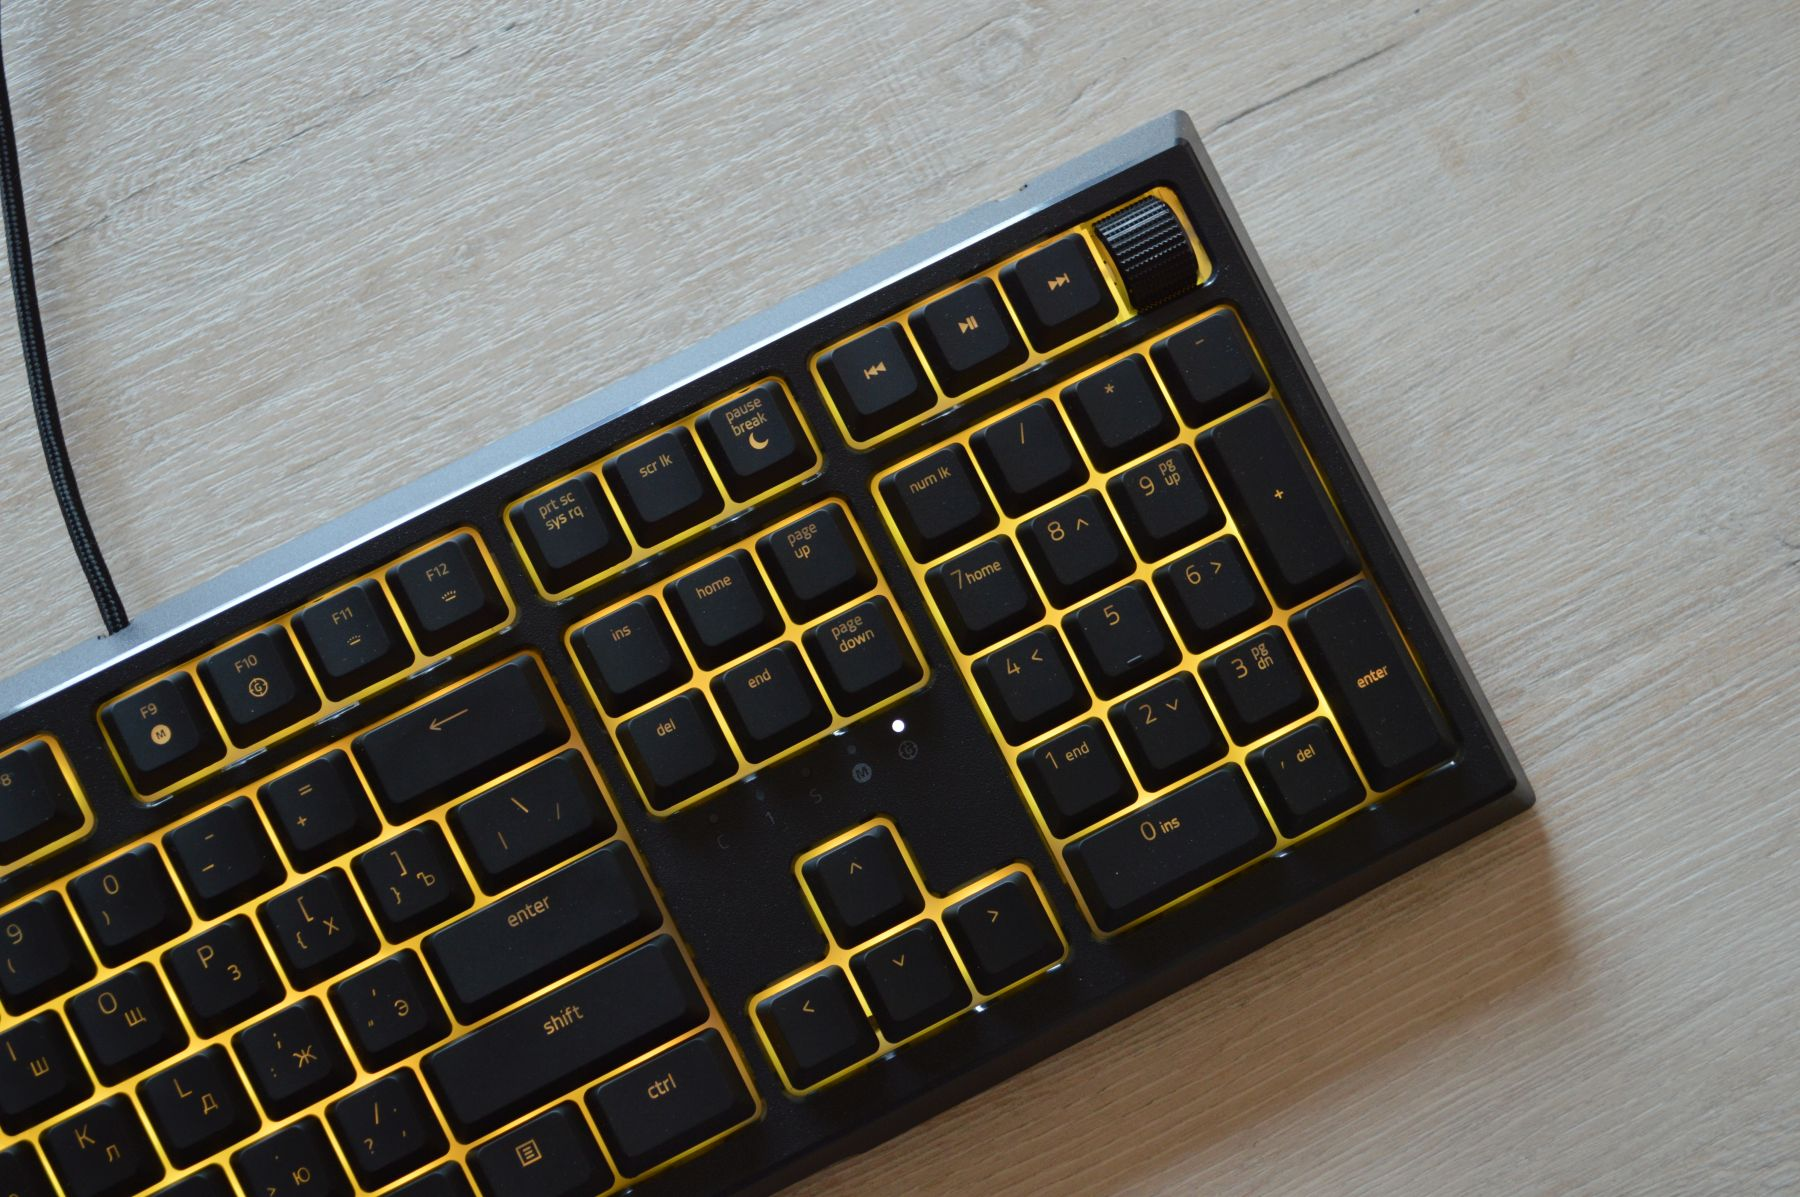 желтая подсветка